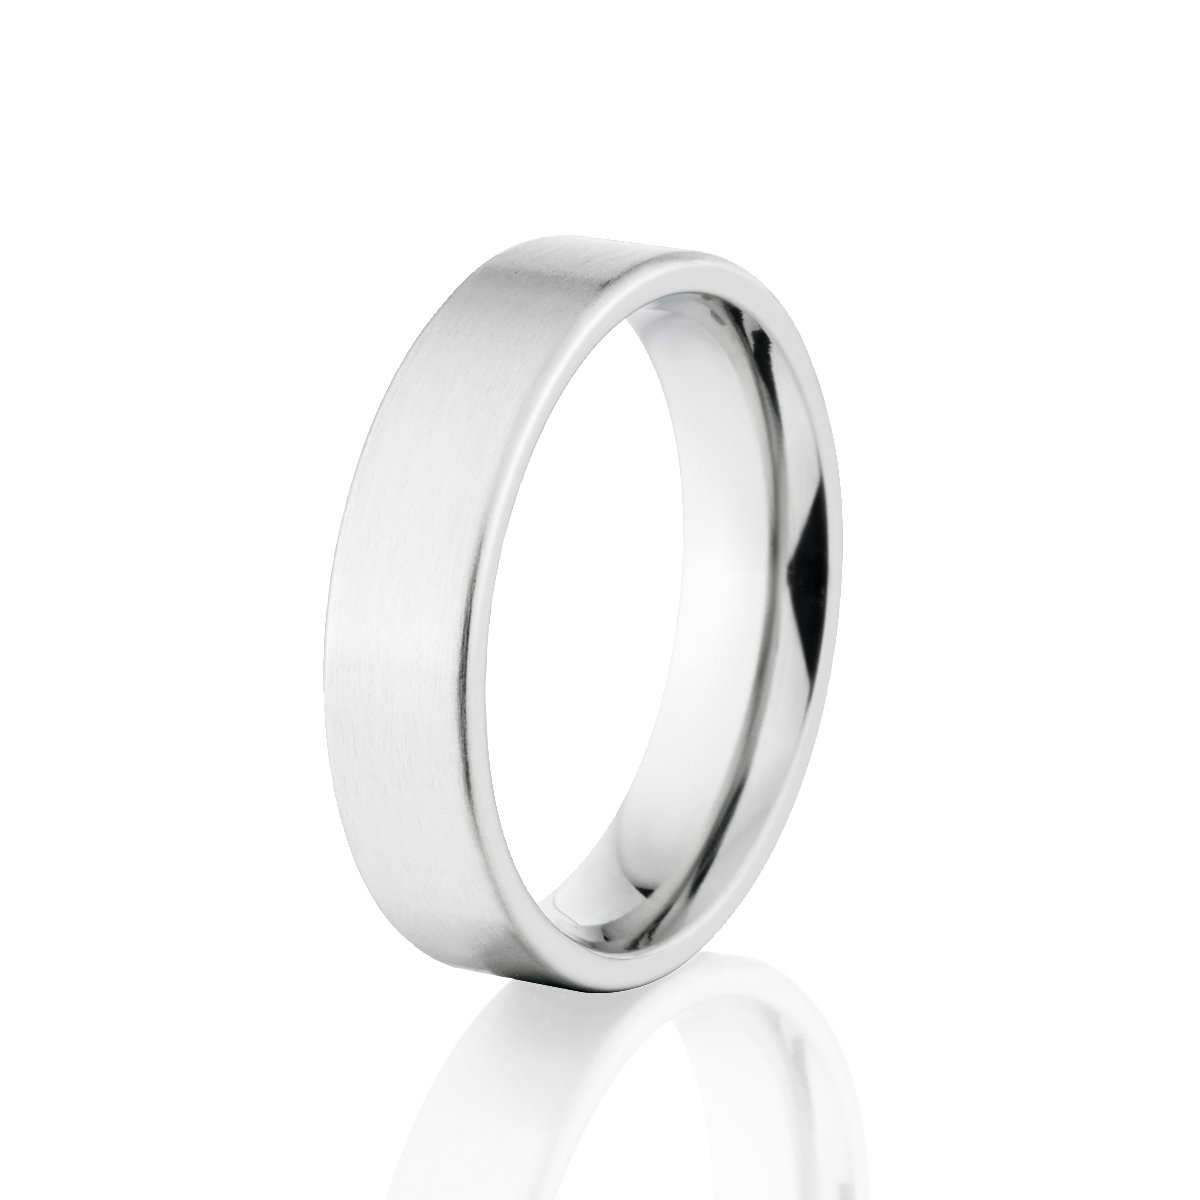 Custom 5mm Cobalt Band, USA Made Cobalt Rings, Comfort Fit Ring